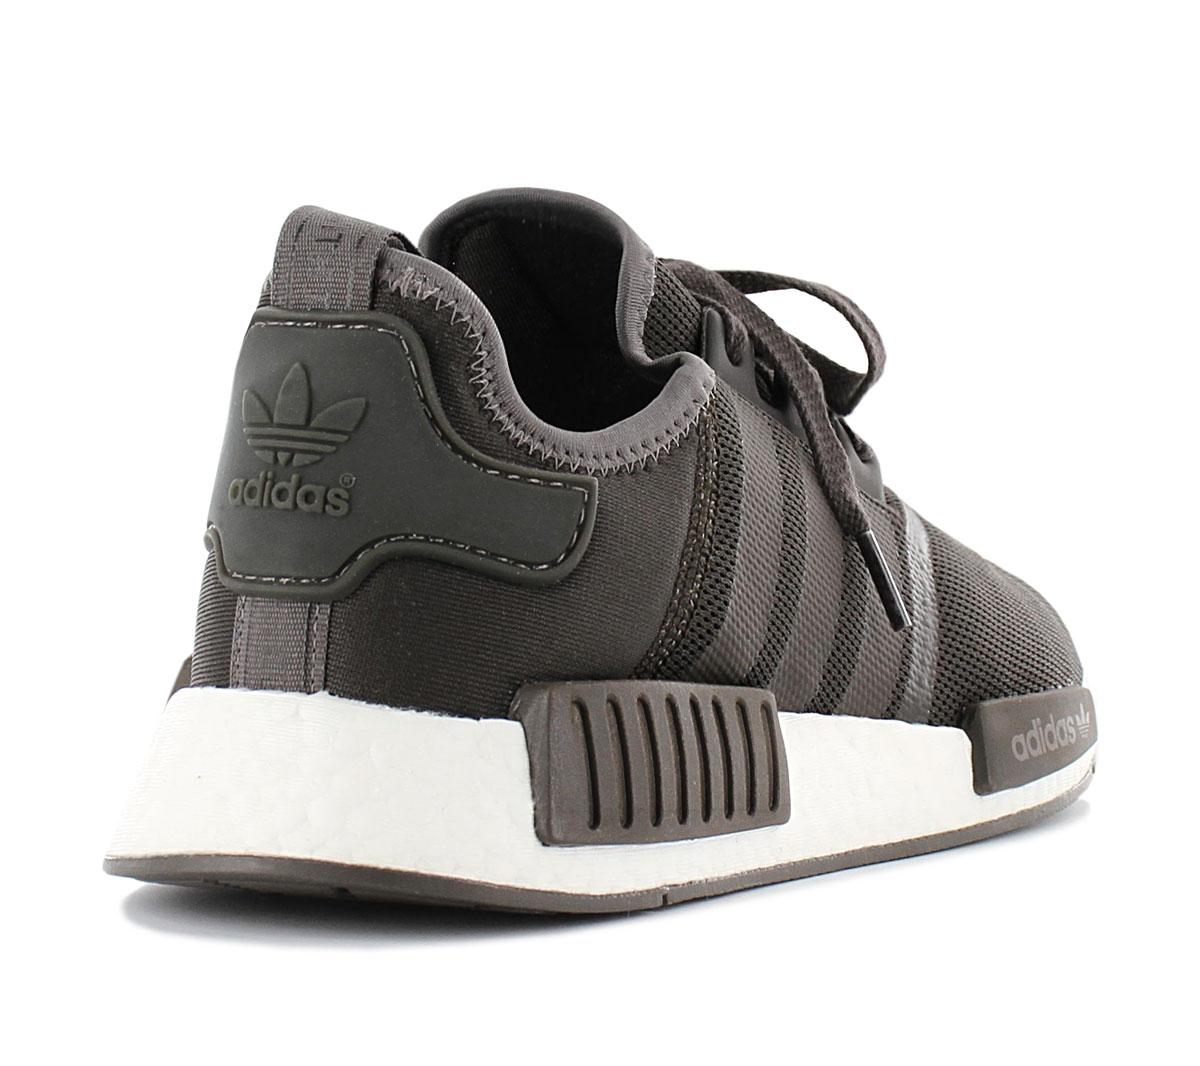 Details zu adidas Originals NMD R1 Boost Trace Grey Metallic CQ2412 Herren Sneaker NEU